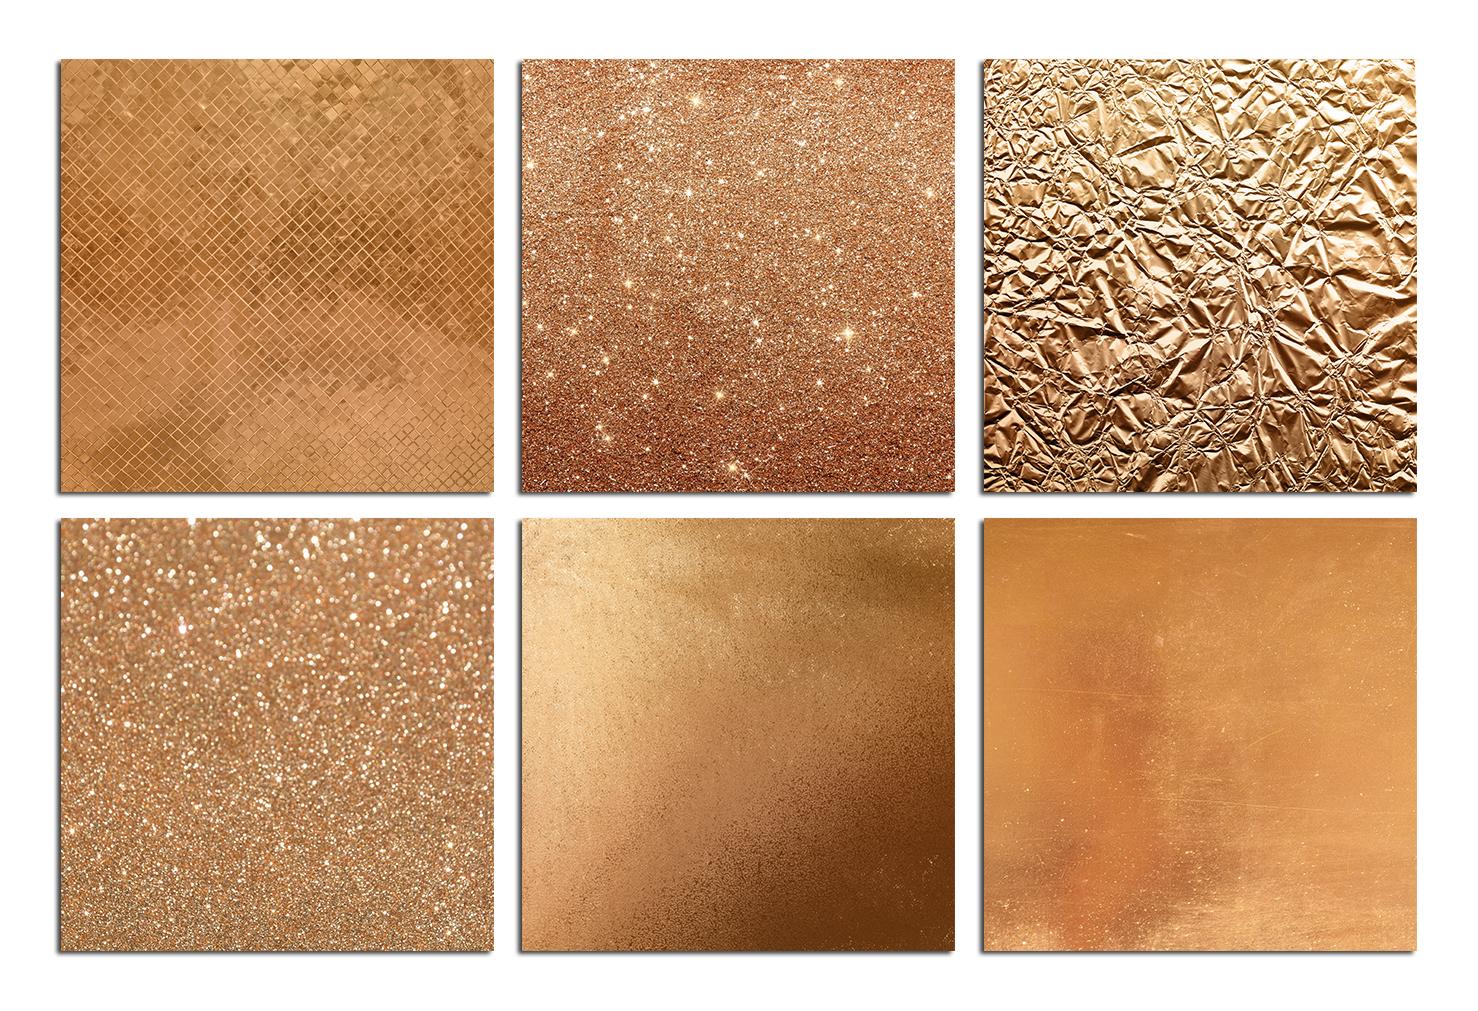 Bronze Foil & Glitter Digital Paper example image 2